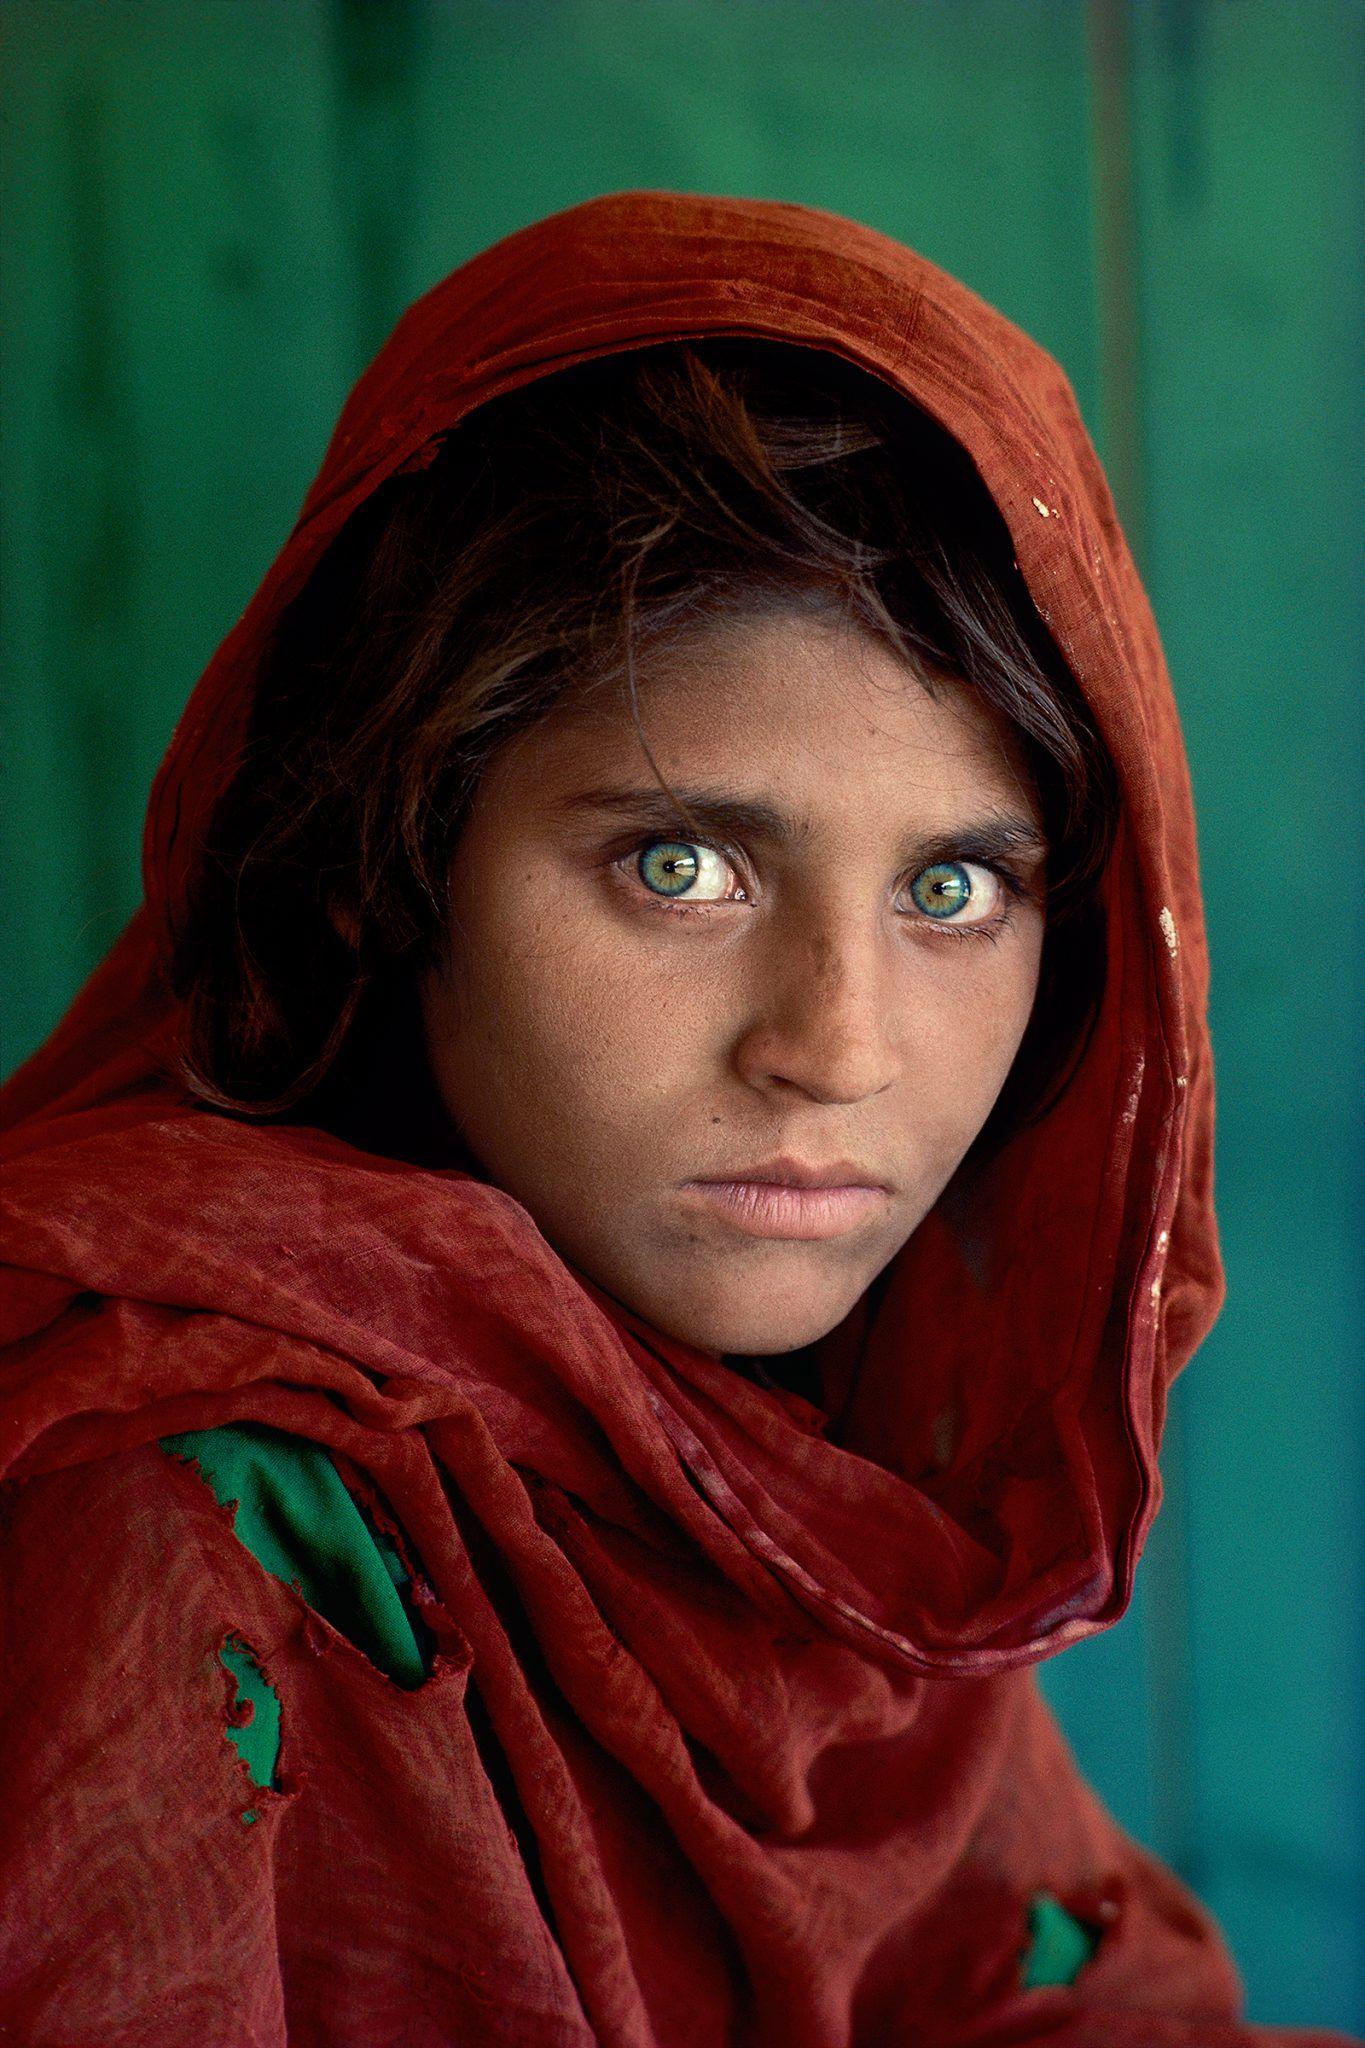 Steve McCurry, La ragazza afghana, Peshawar, Pakistan, 1984, Museo Civico Sansepolcro